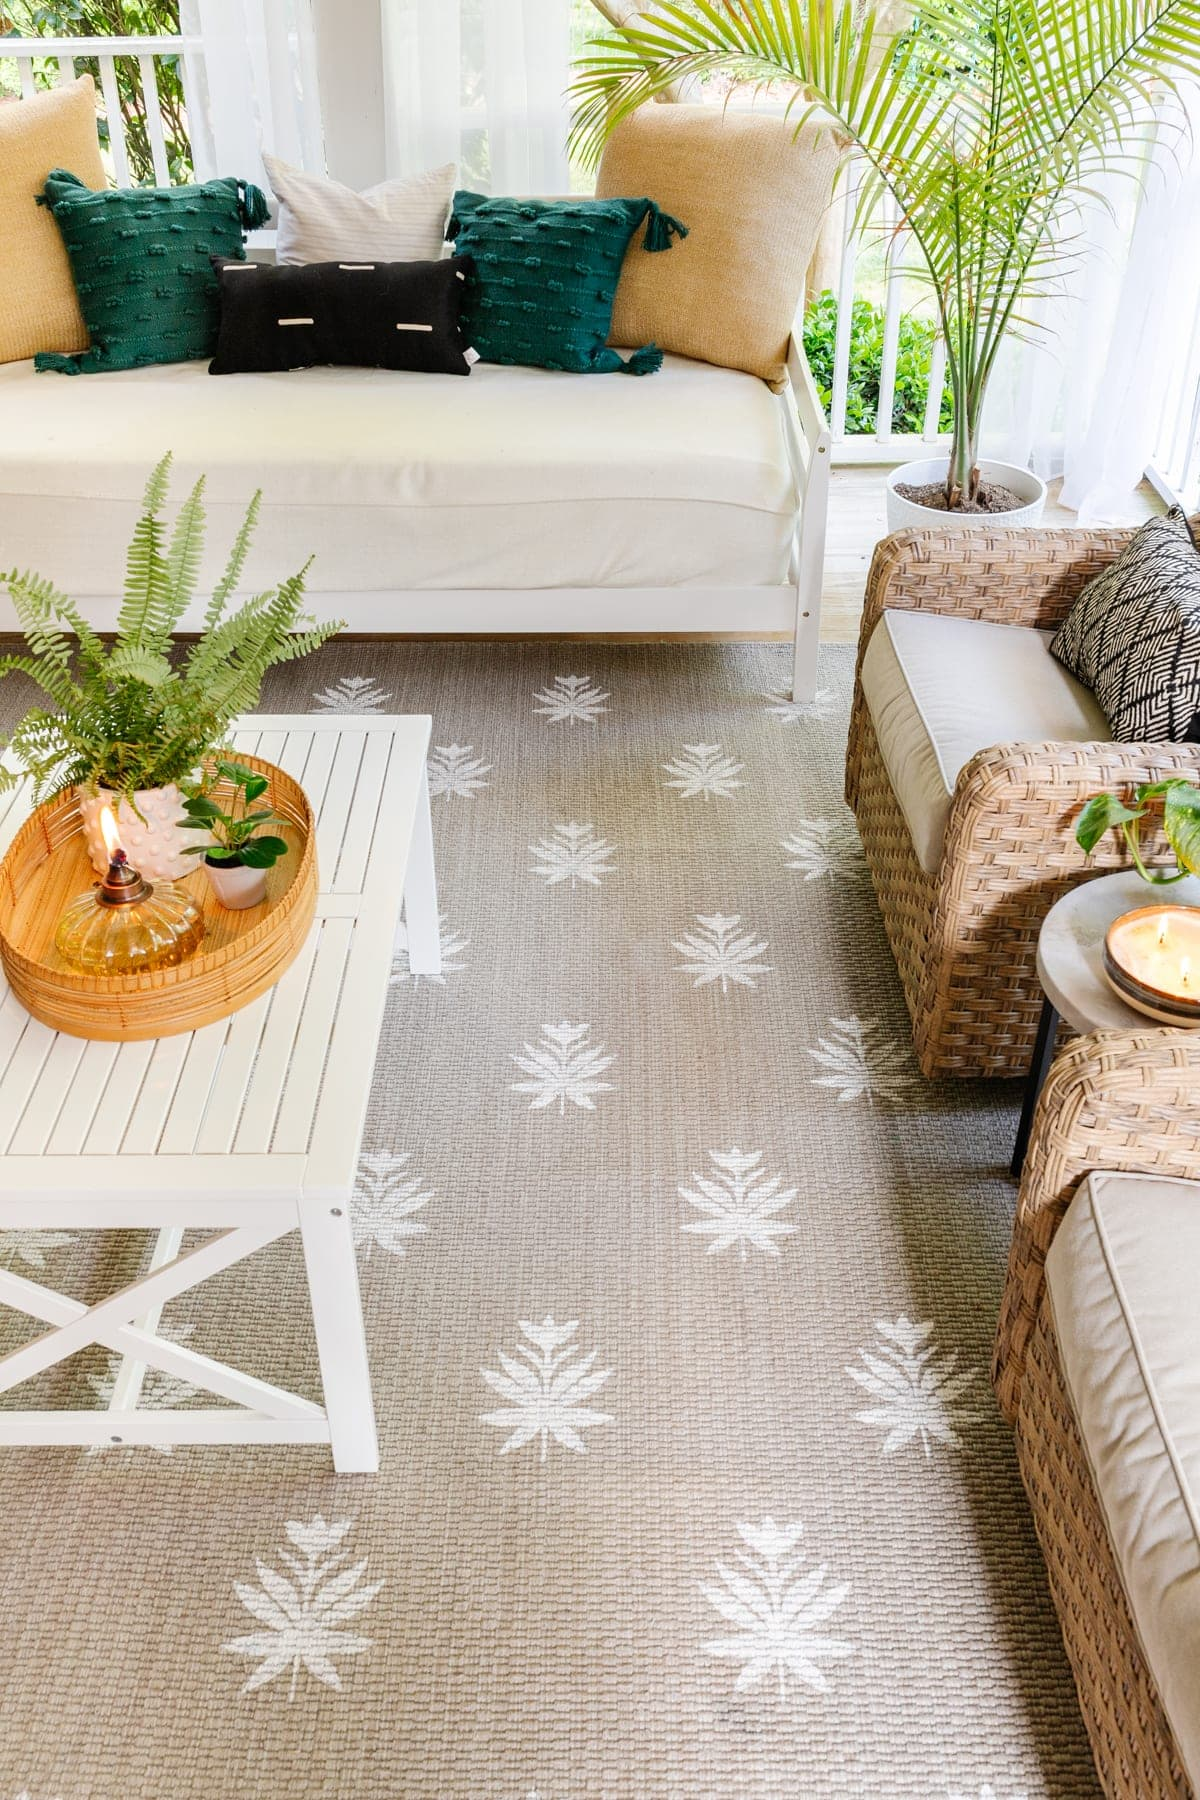 stenciled outdoor rug using a Cricut machine